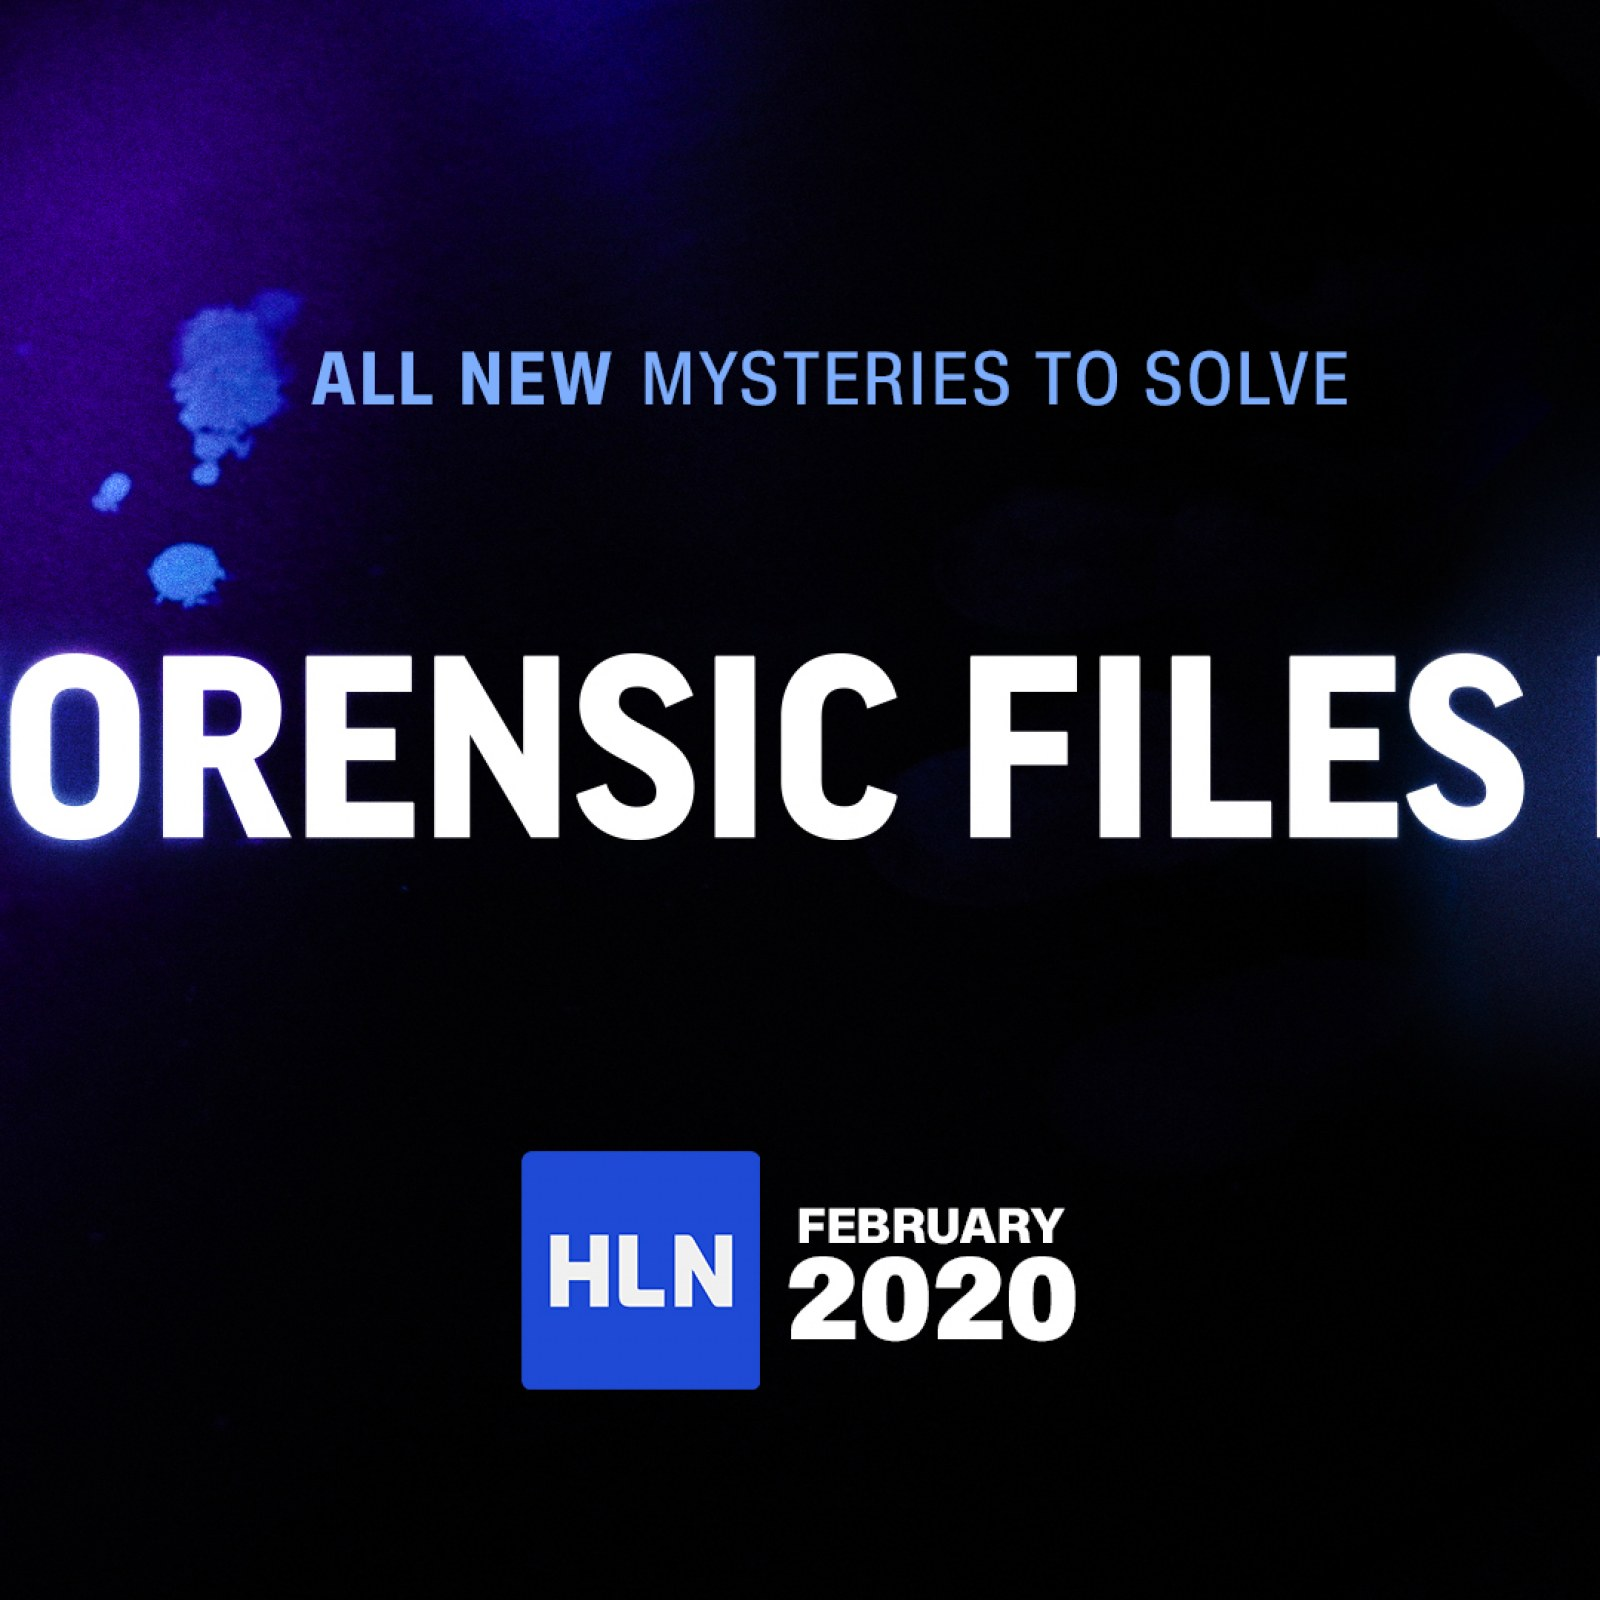 Forensic Files Reboot Classic True Crime Series Will Air New Season In 2020